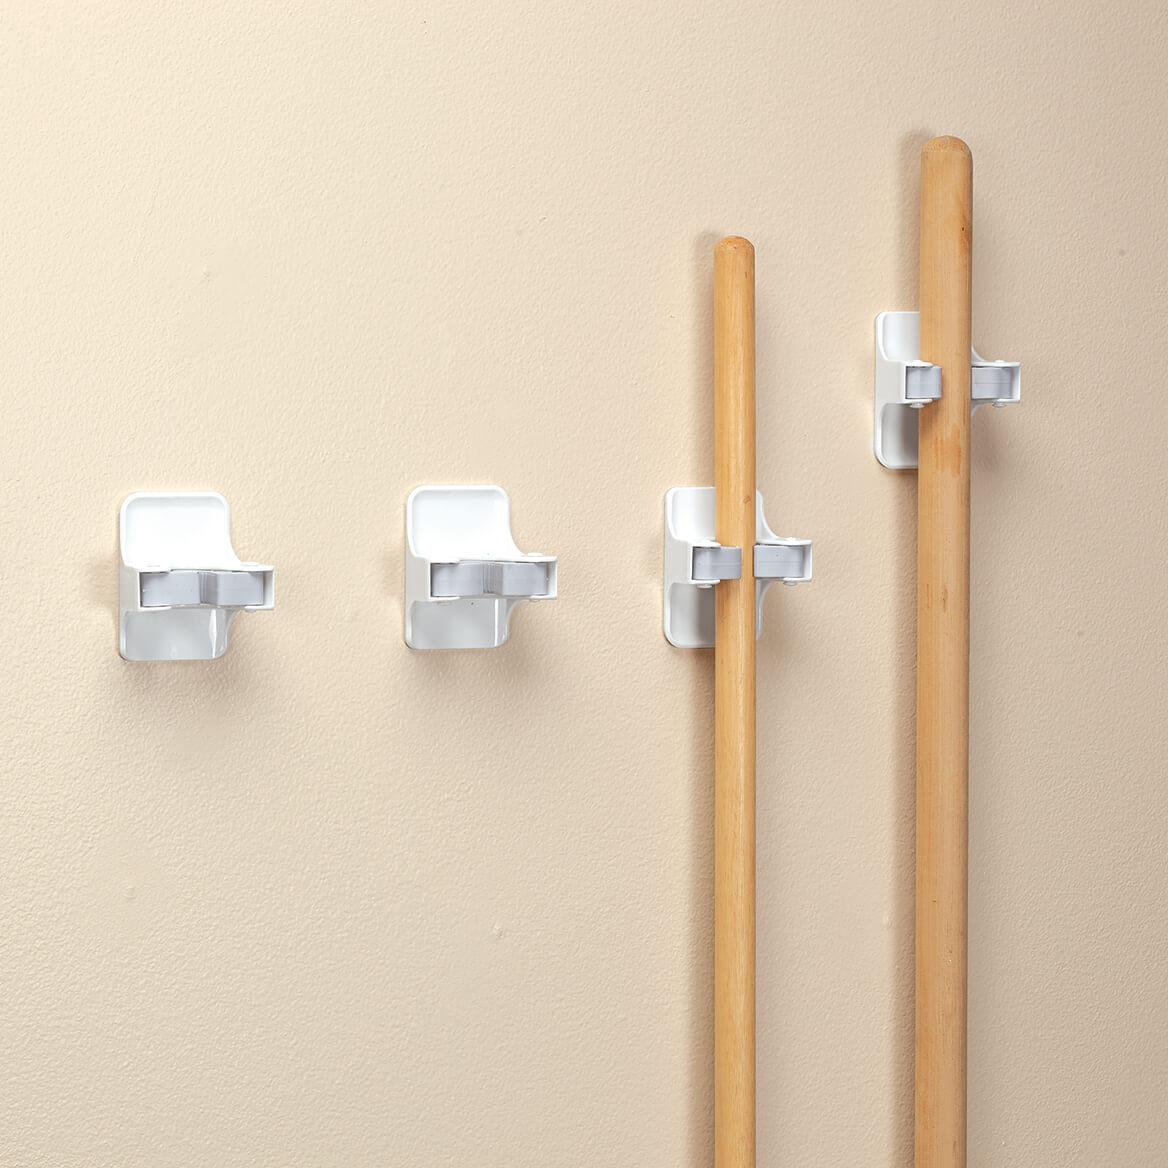 Self-Adhesive Broom Holders, Set of 4-371234